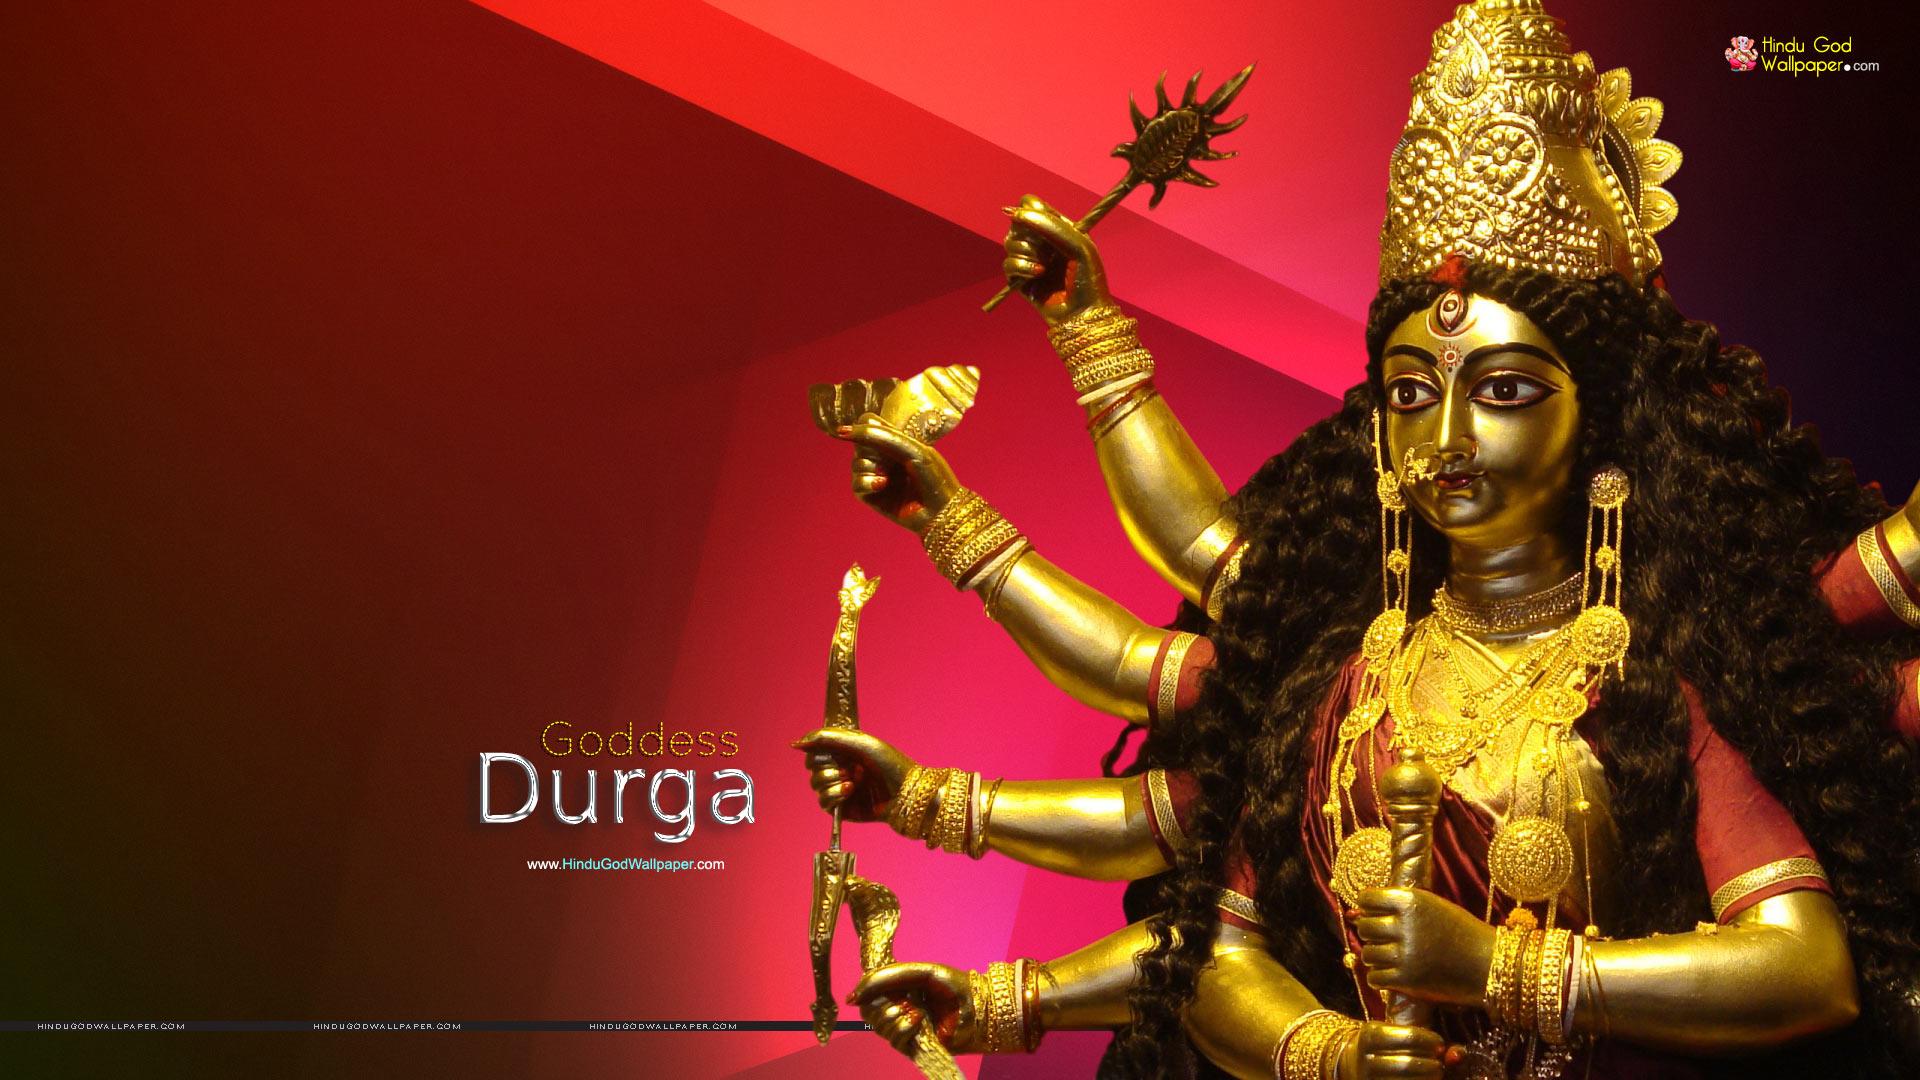 Durga-Puja-HD-for-Desktop-Maa-Durga-HD-wallpaper-wp4605534-1